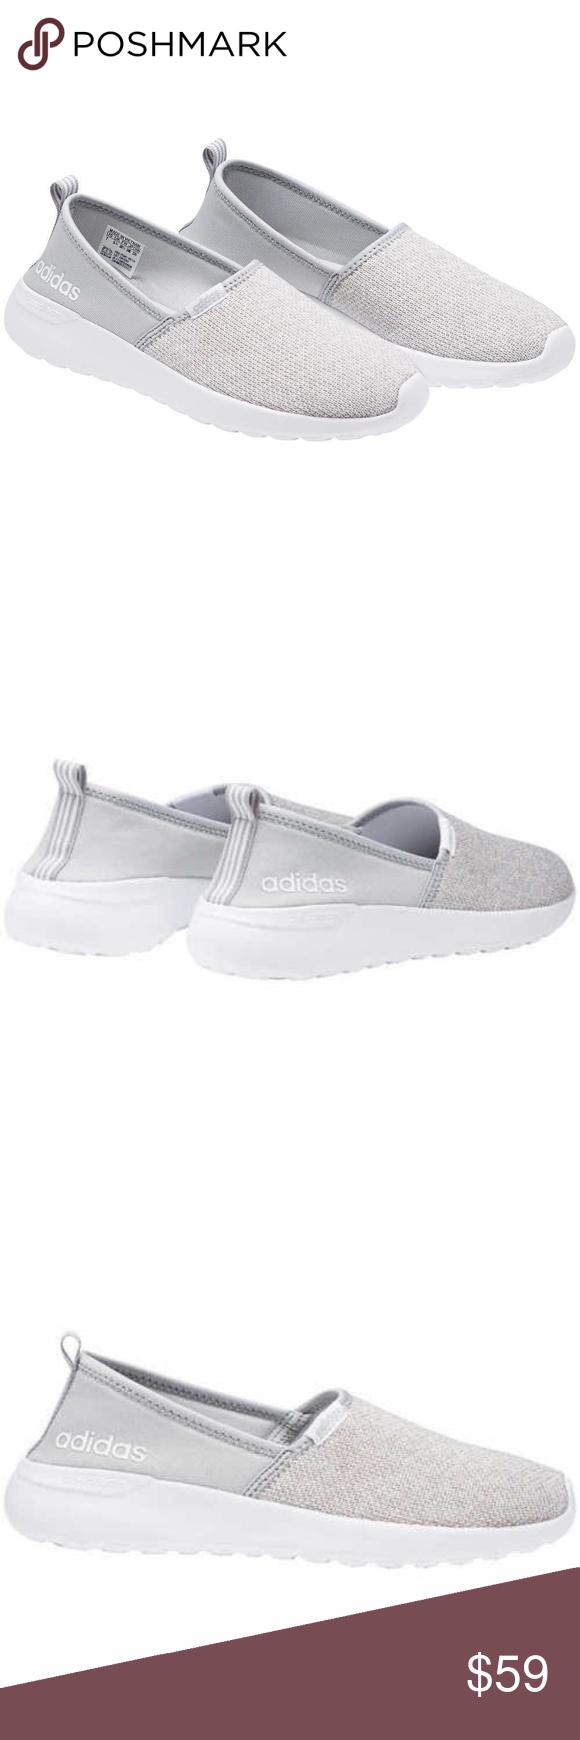 adidas scivolare su cloudfoam neo lite racer scarpe boutique adidas